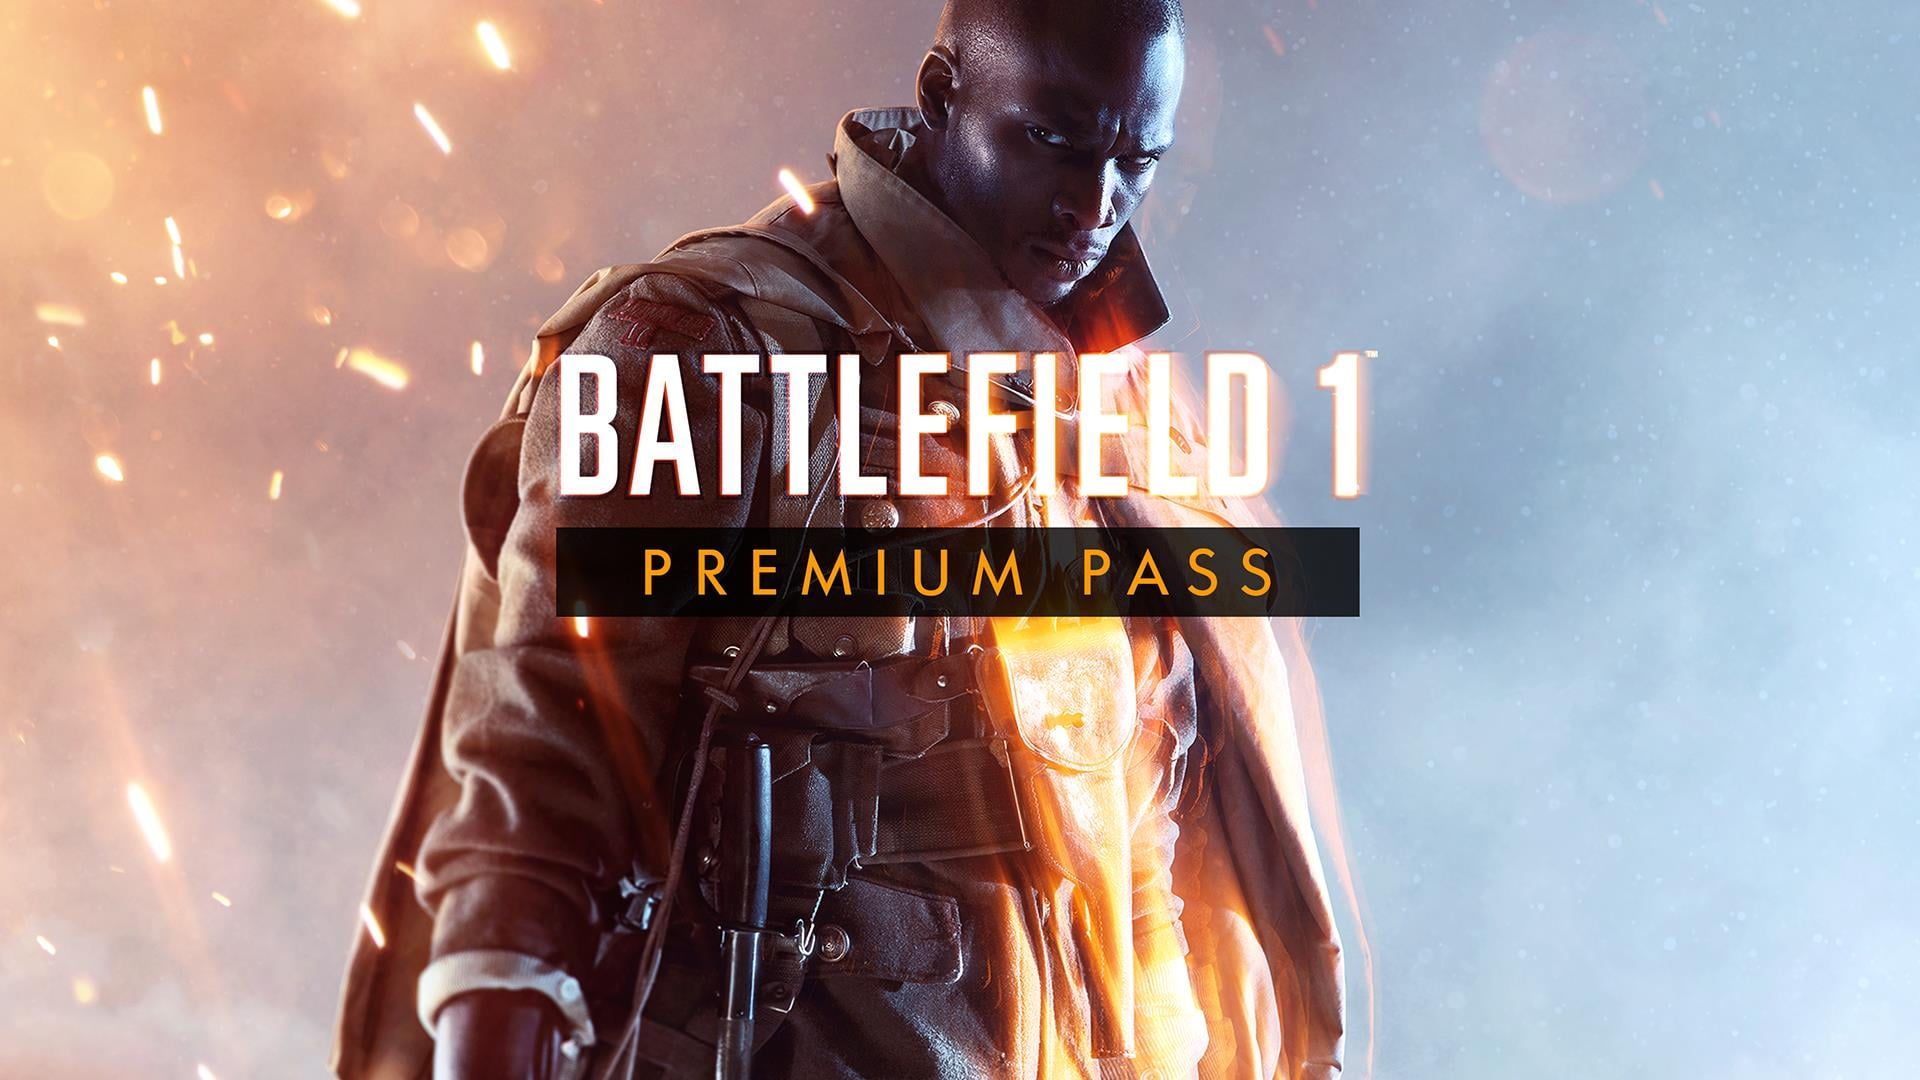 battlefield 1 premium pass and first dlc pack detailed